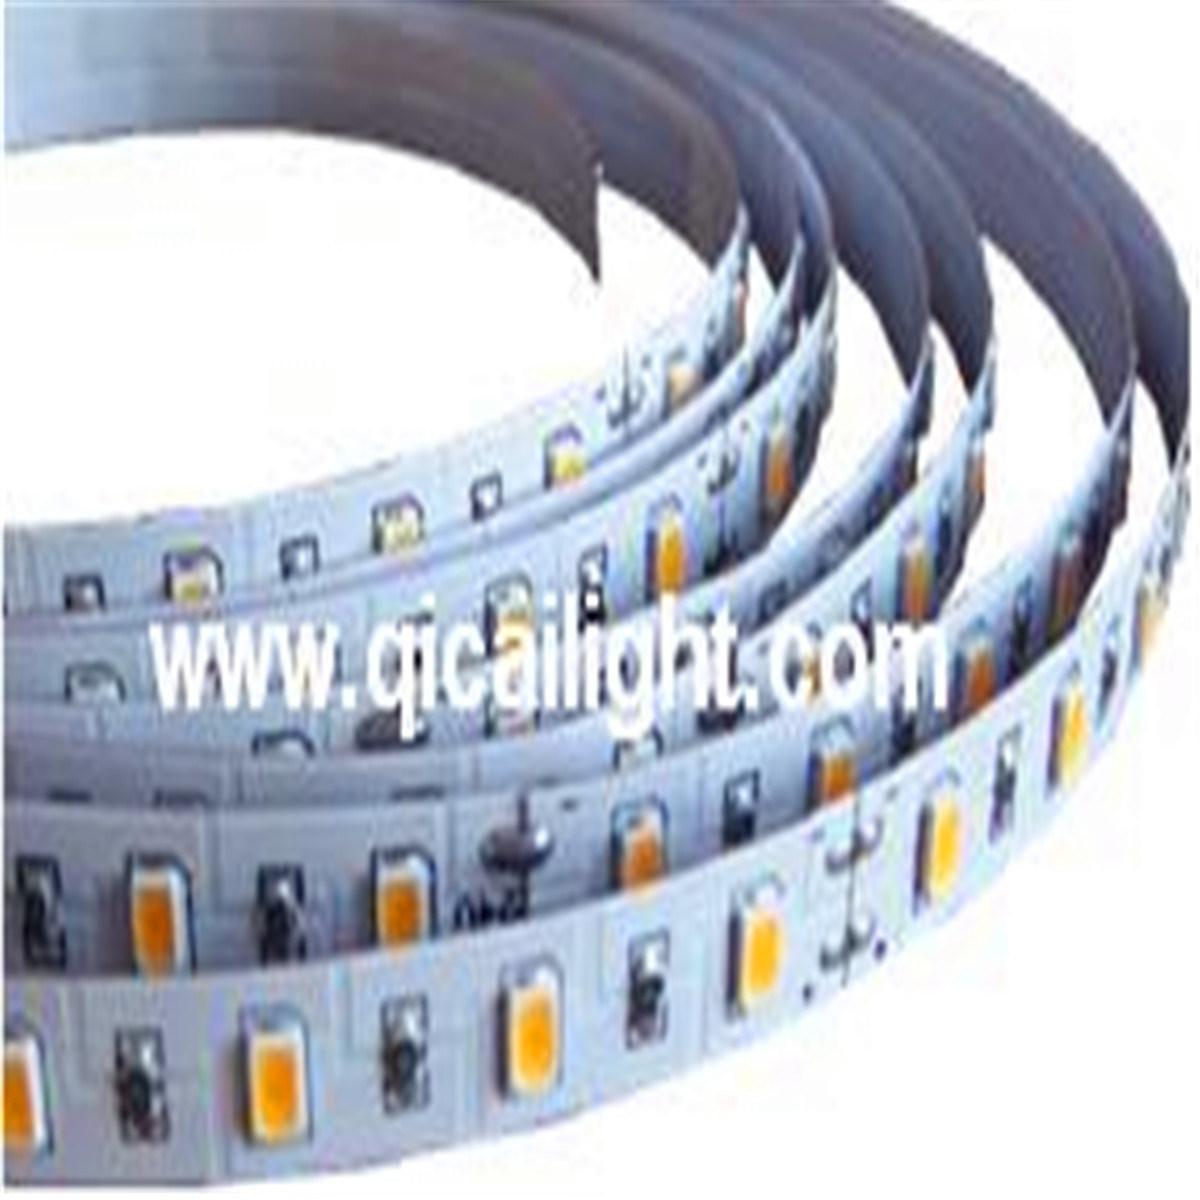 Ws2811 Digital LED Strip Light